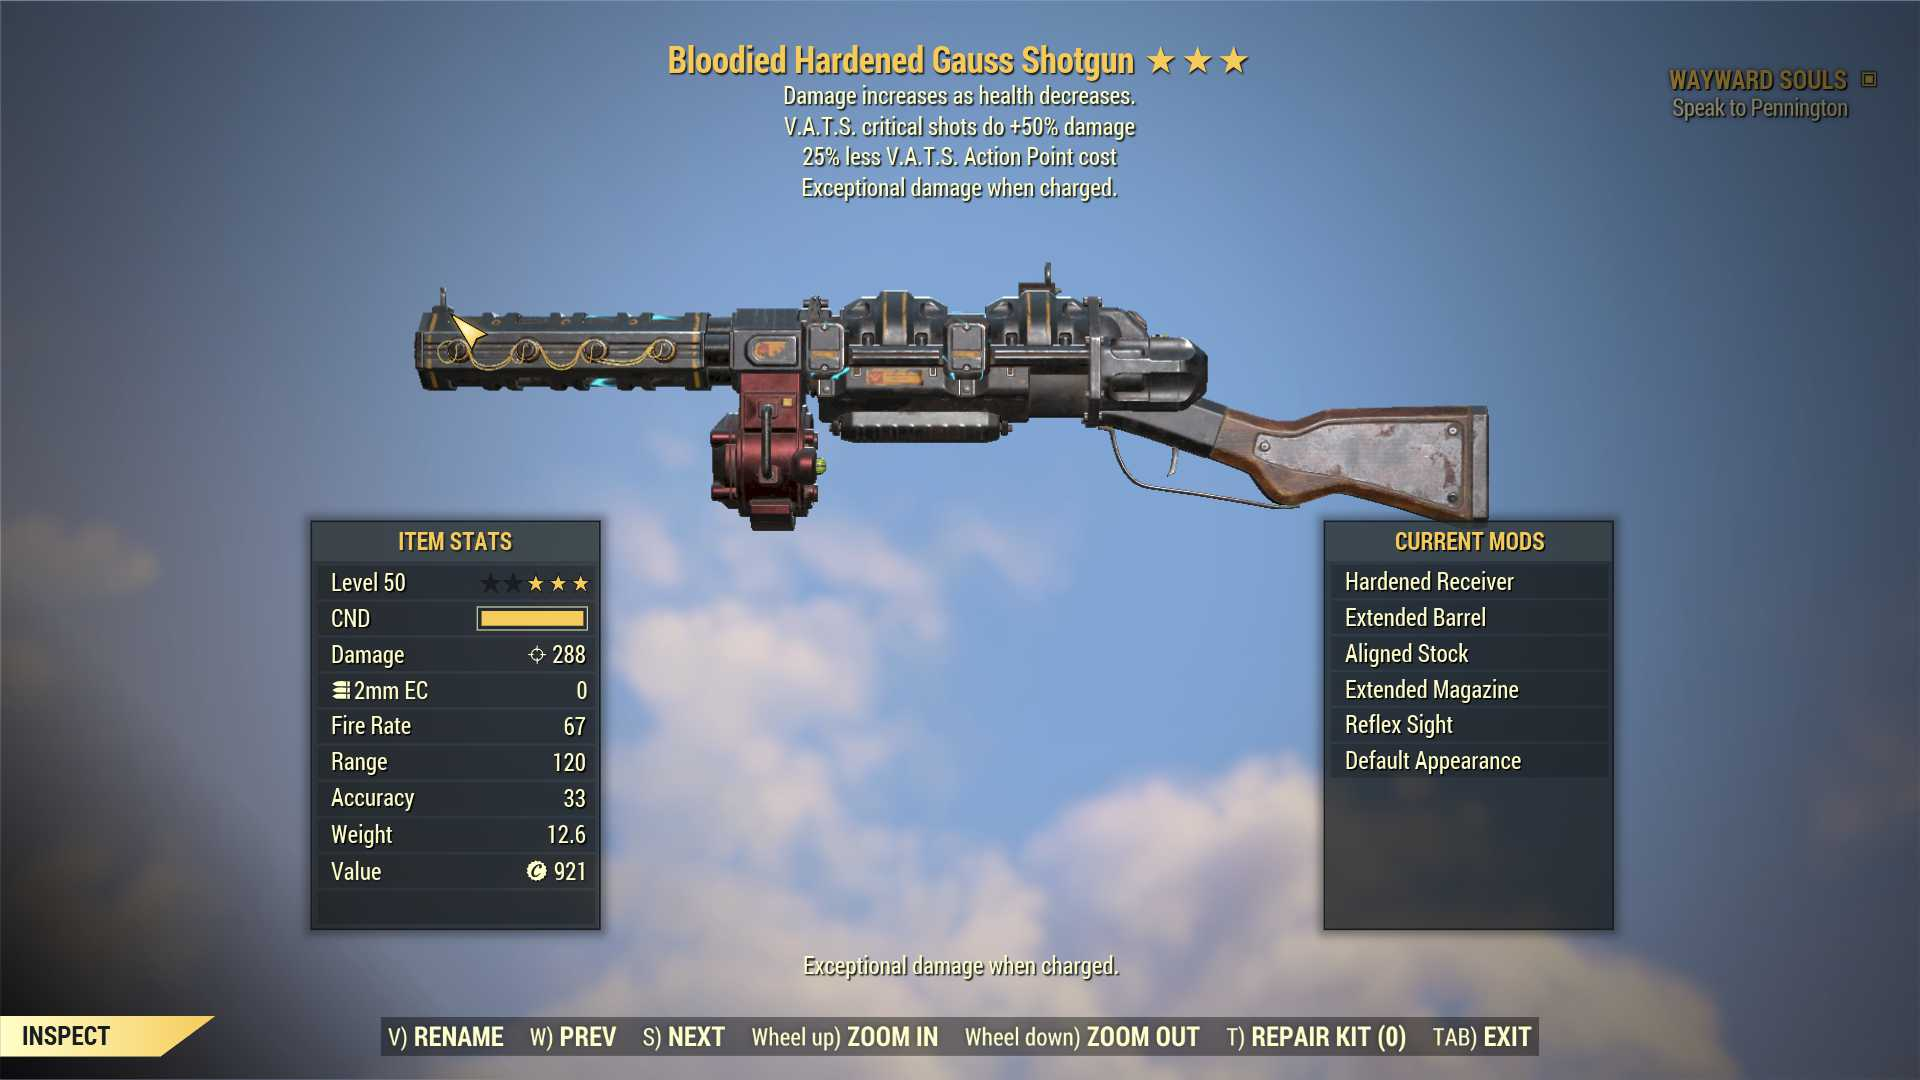 Bloodied Gauss Shotgun (+50% critical damage, 25% less VATS AP cost) FULL MODDED [Wastelanders]